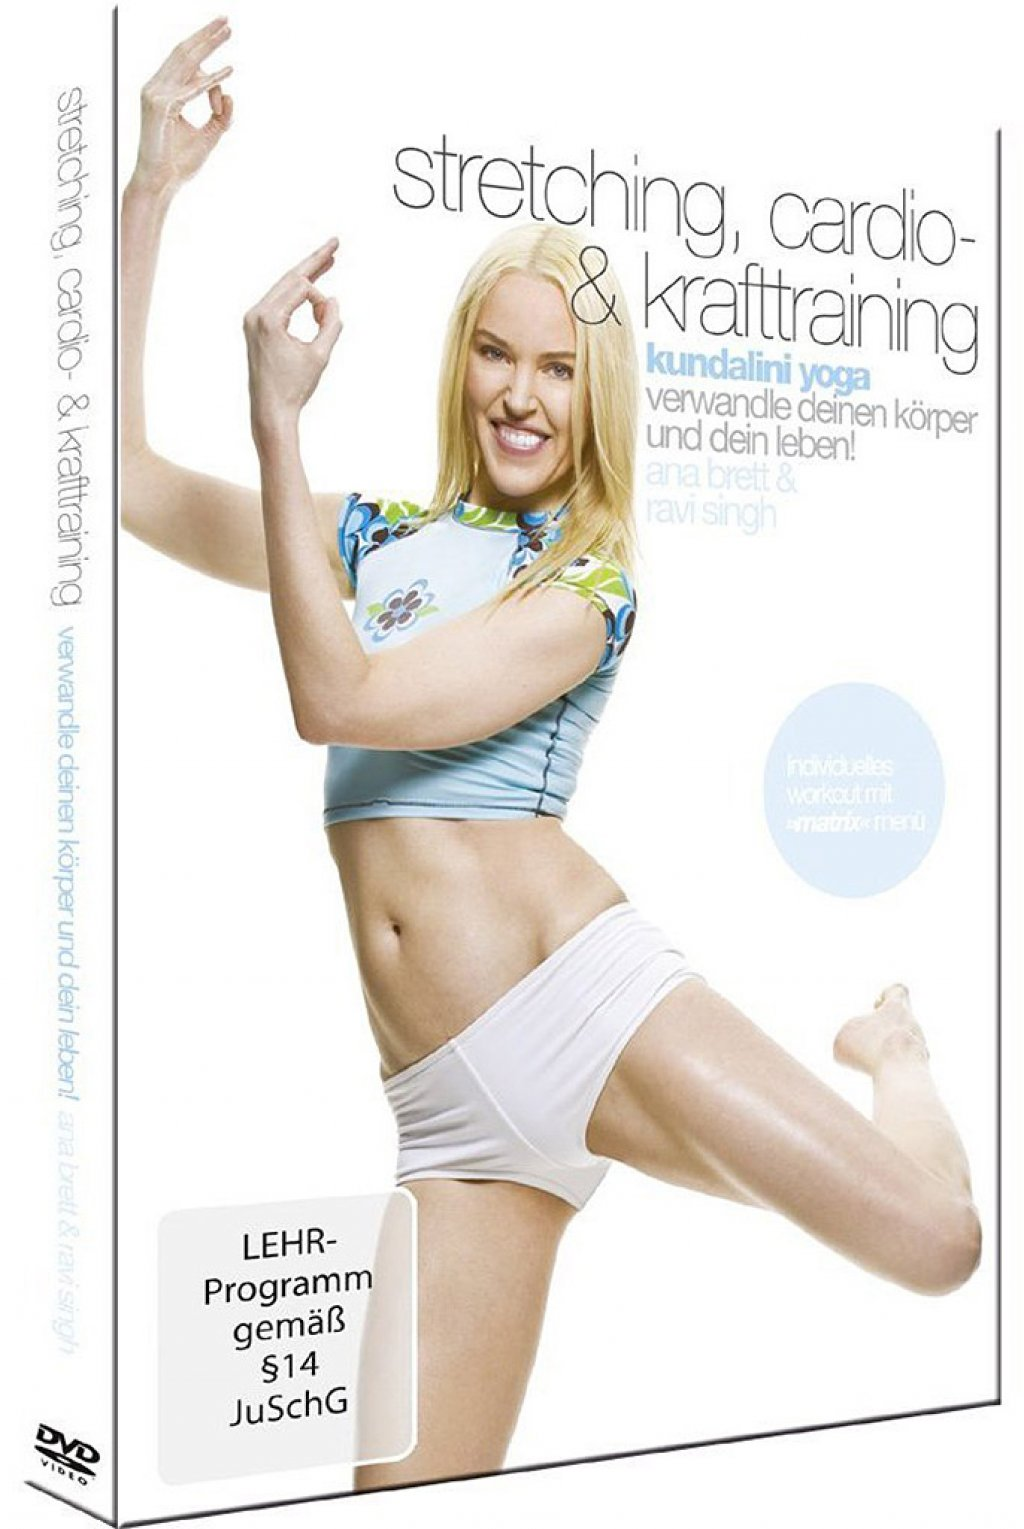 Stretching, Cardio-& Krafttraining - Kundalini Yoga (DVD)